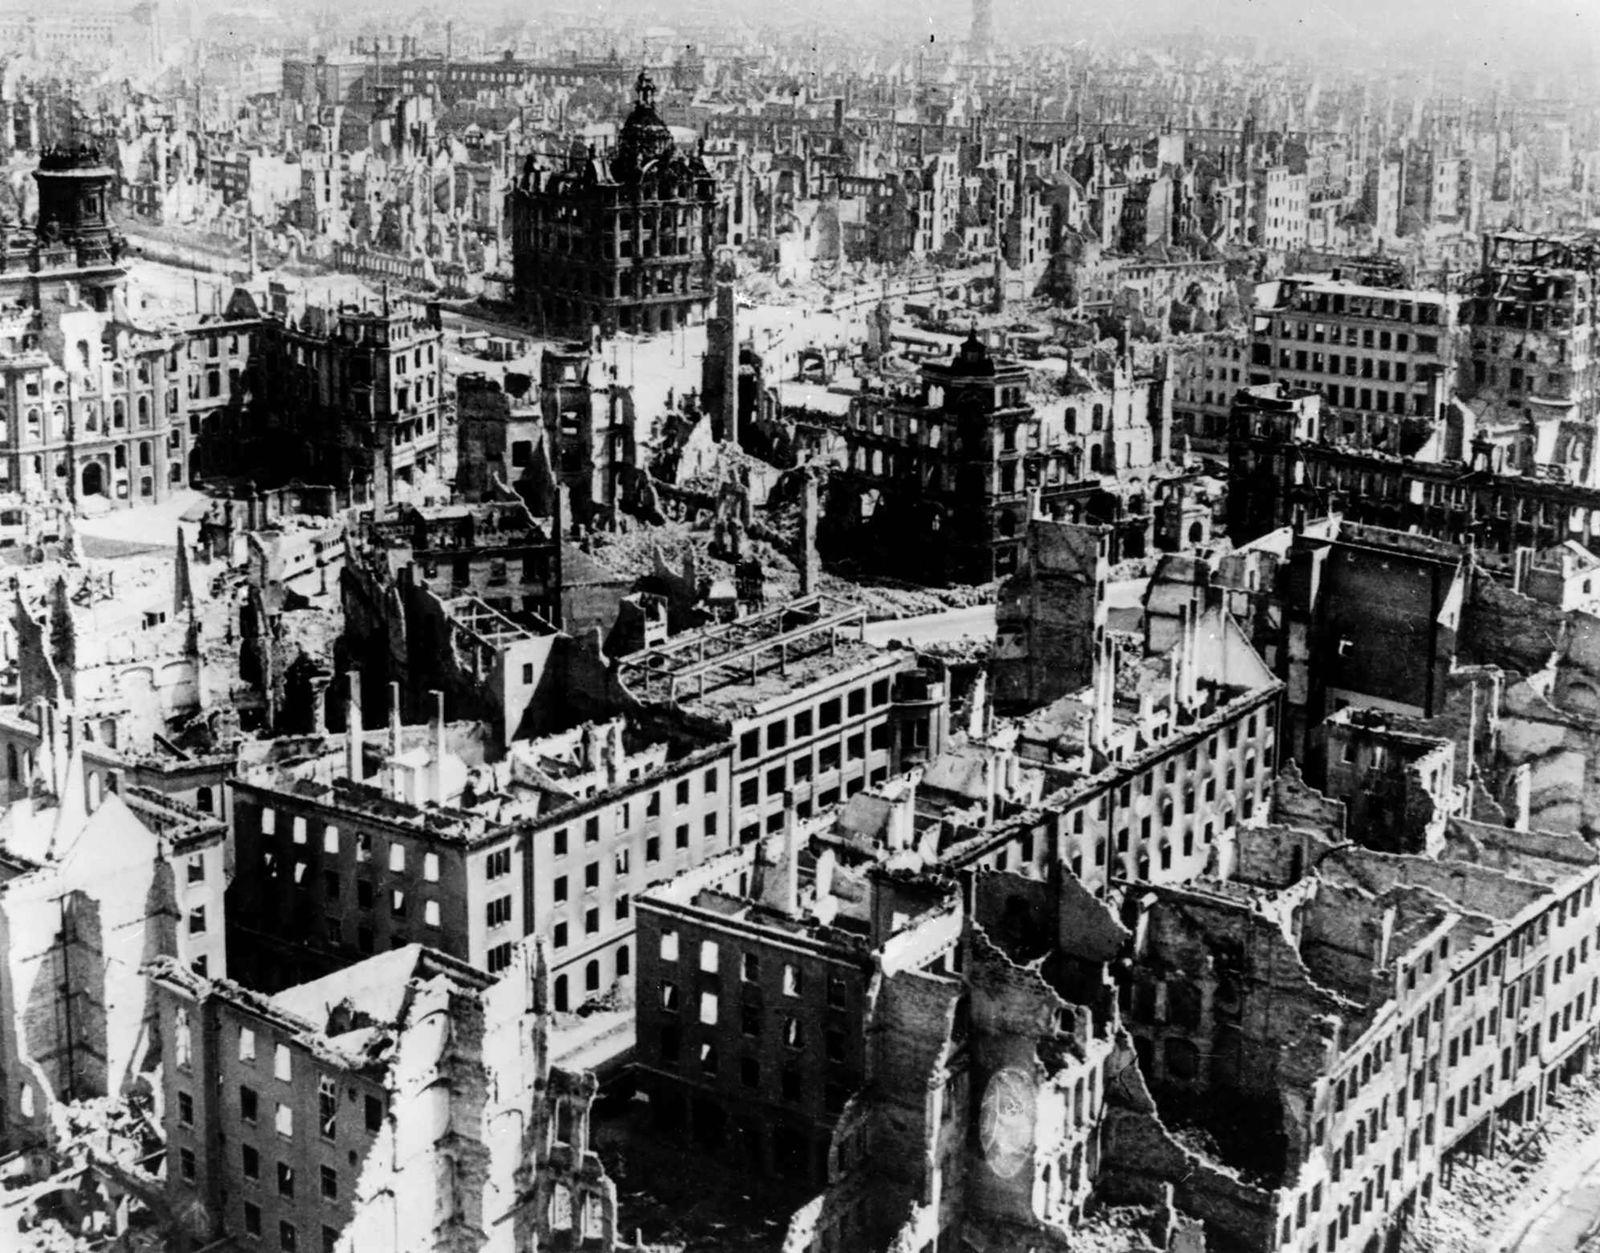 Bombardierung Dresden - 2. Weltkrieg - Ruinen in Dresden